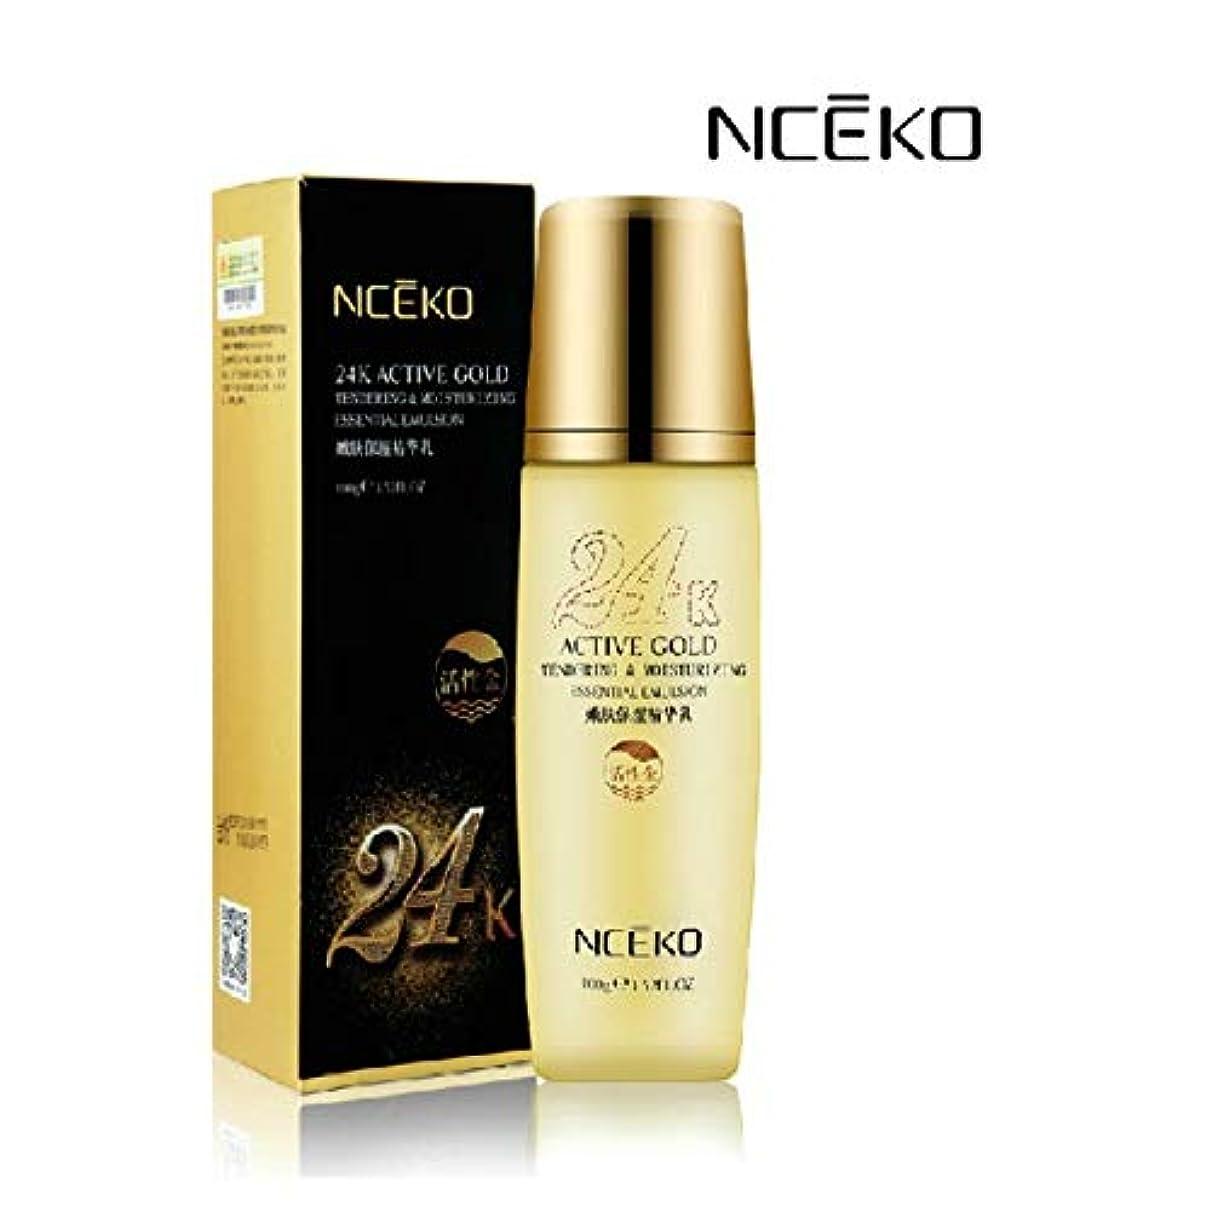 NCEKO 24Kアクティブ若返りエマルジョンフェイスエッセンスモイスチャライジングクリーム寧をエイジングケアアンチリンクルリフティング